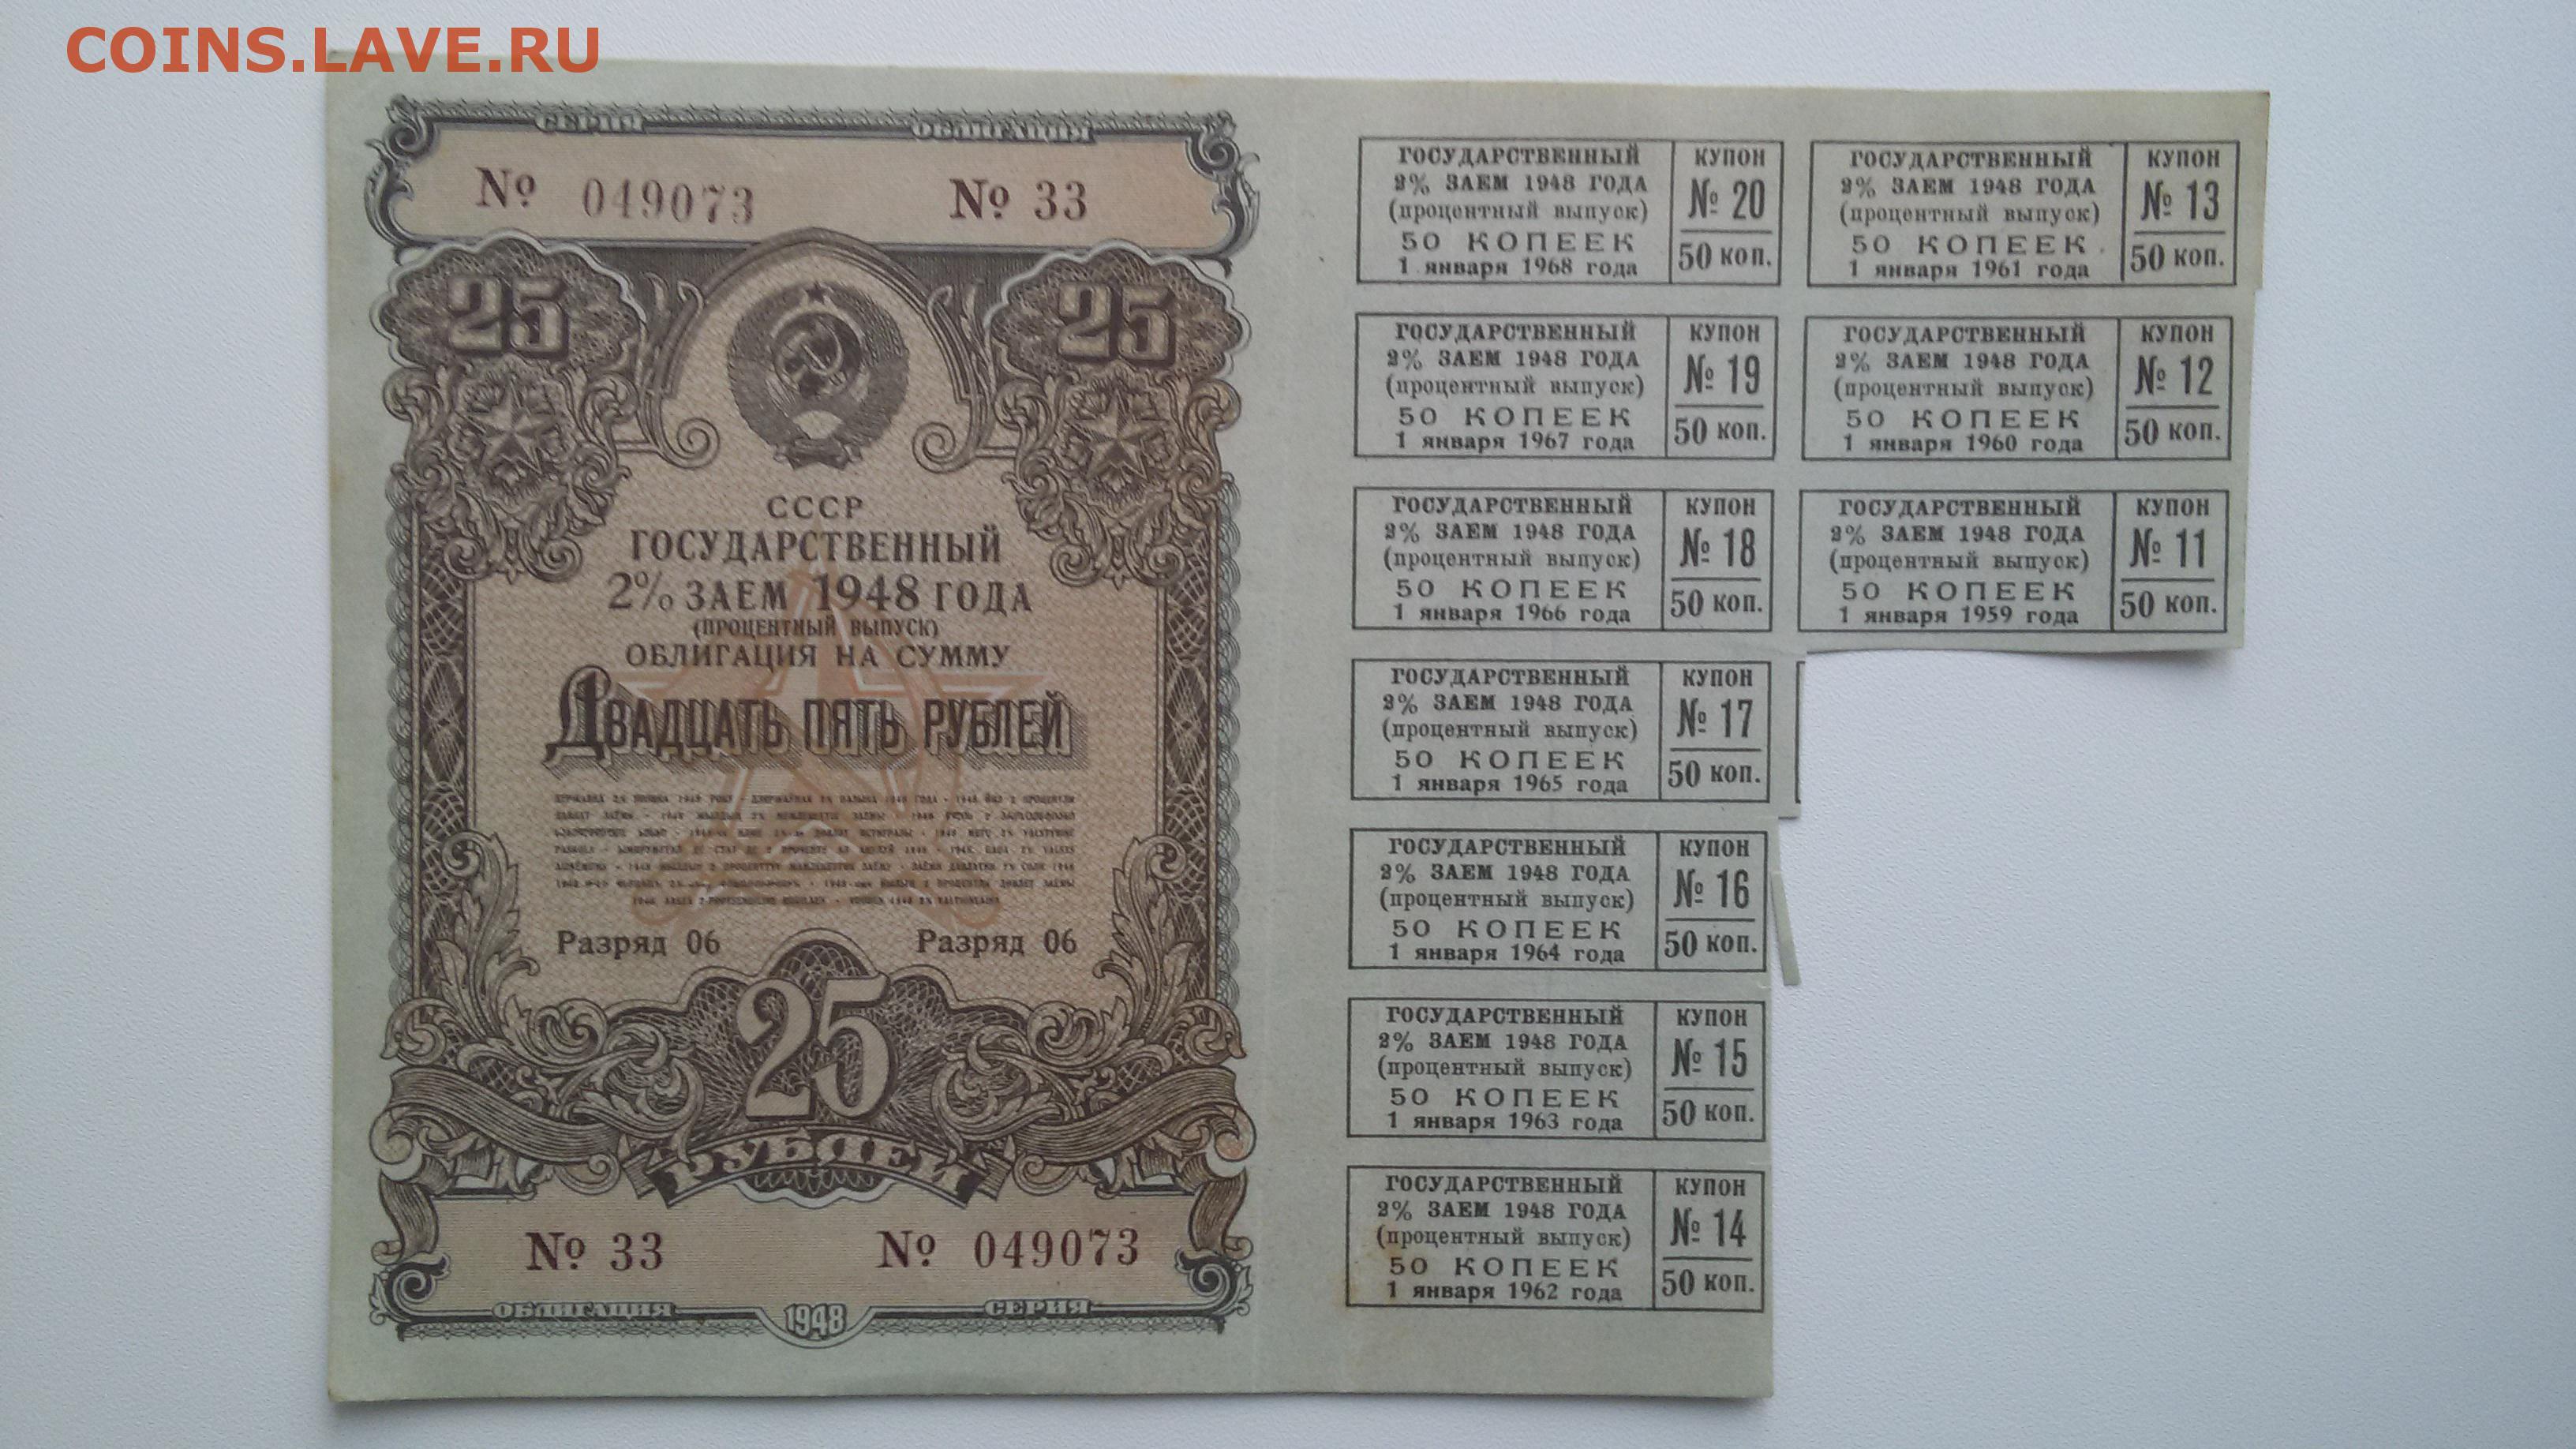 2 займ 1948 года займы у частных лиц под расписку в иркутске